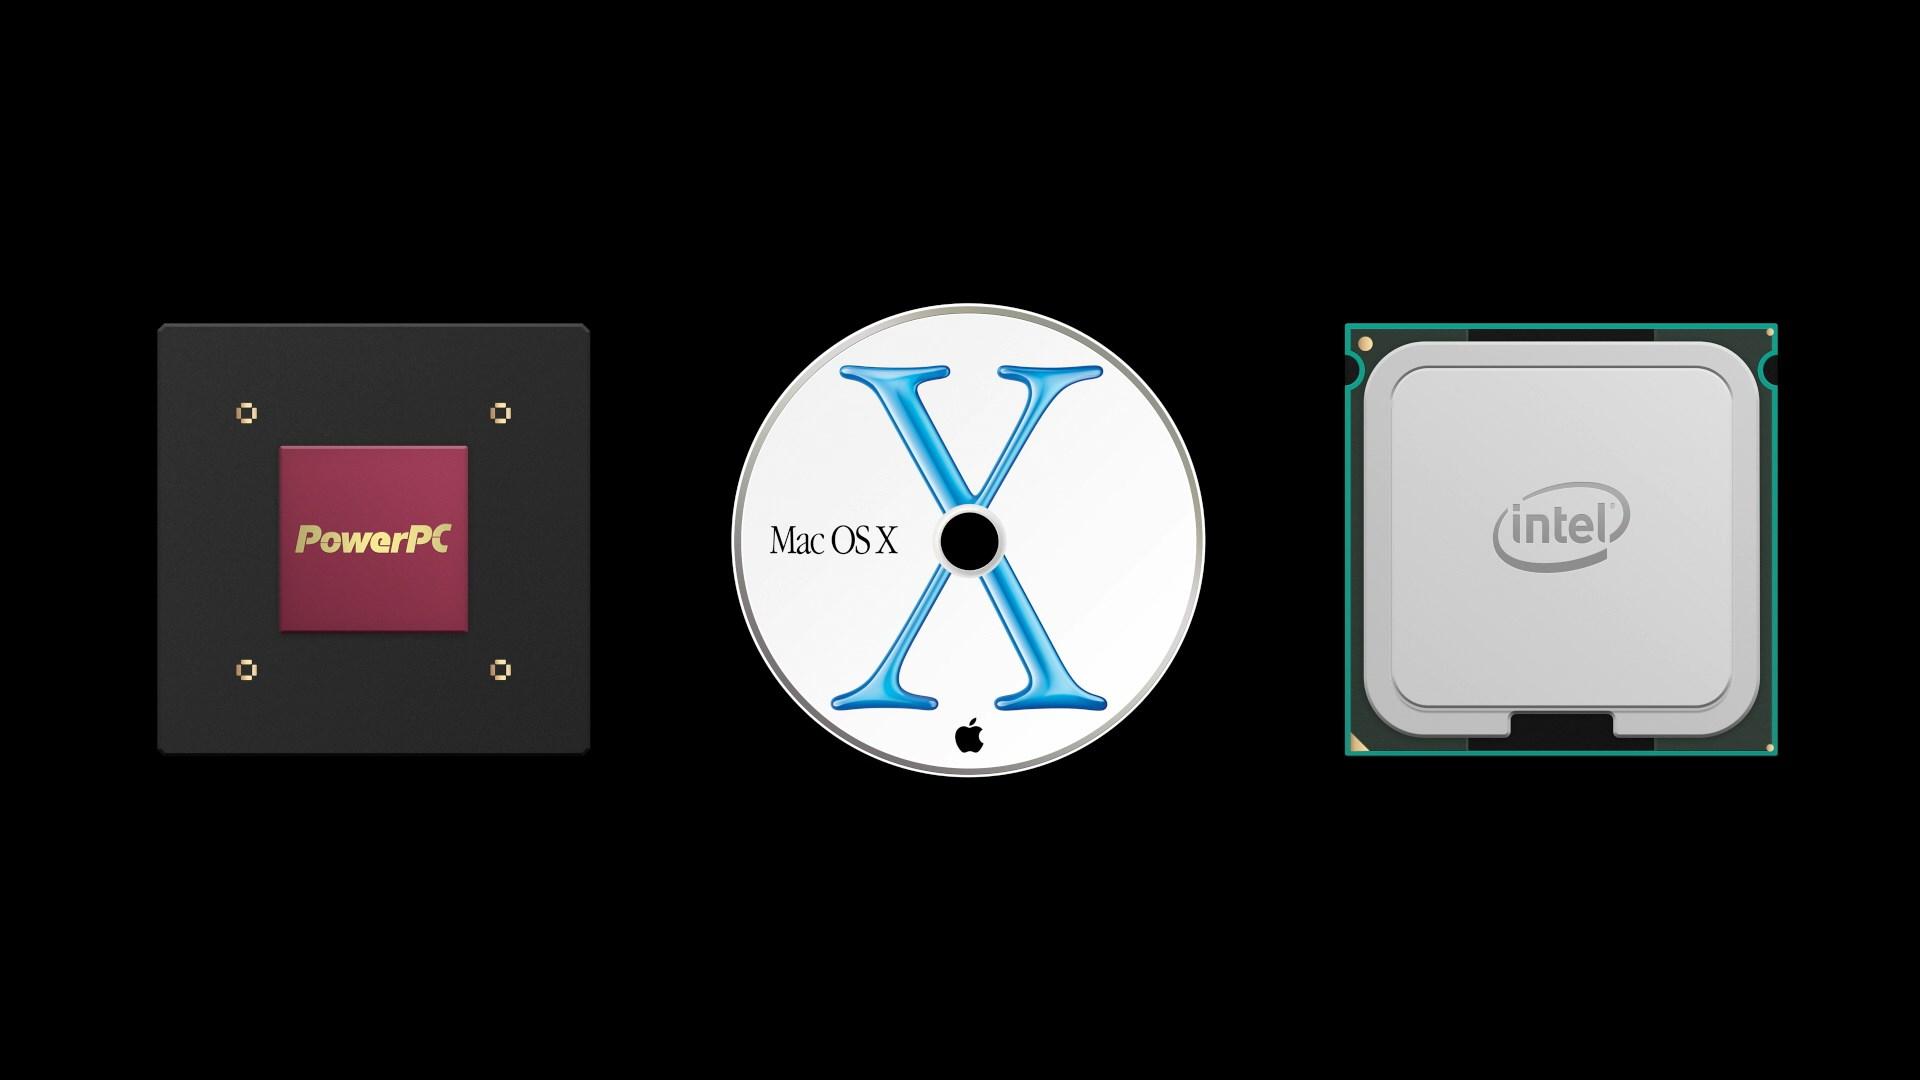 Power PC, Mac OS X, and Intel processor.